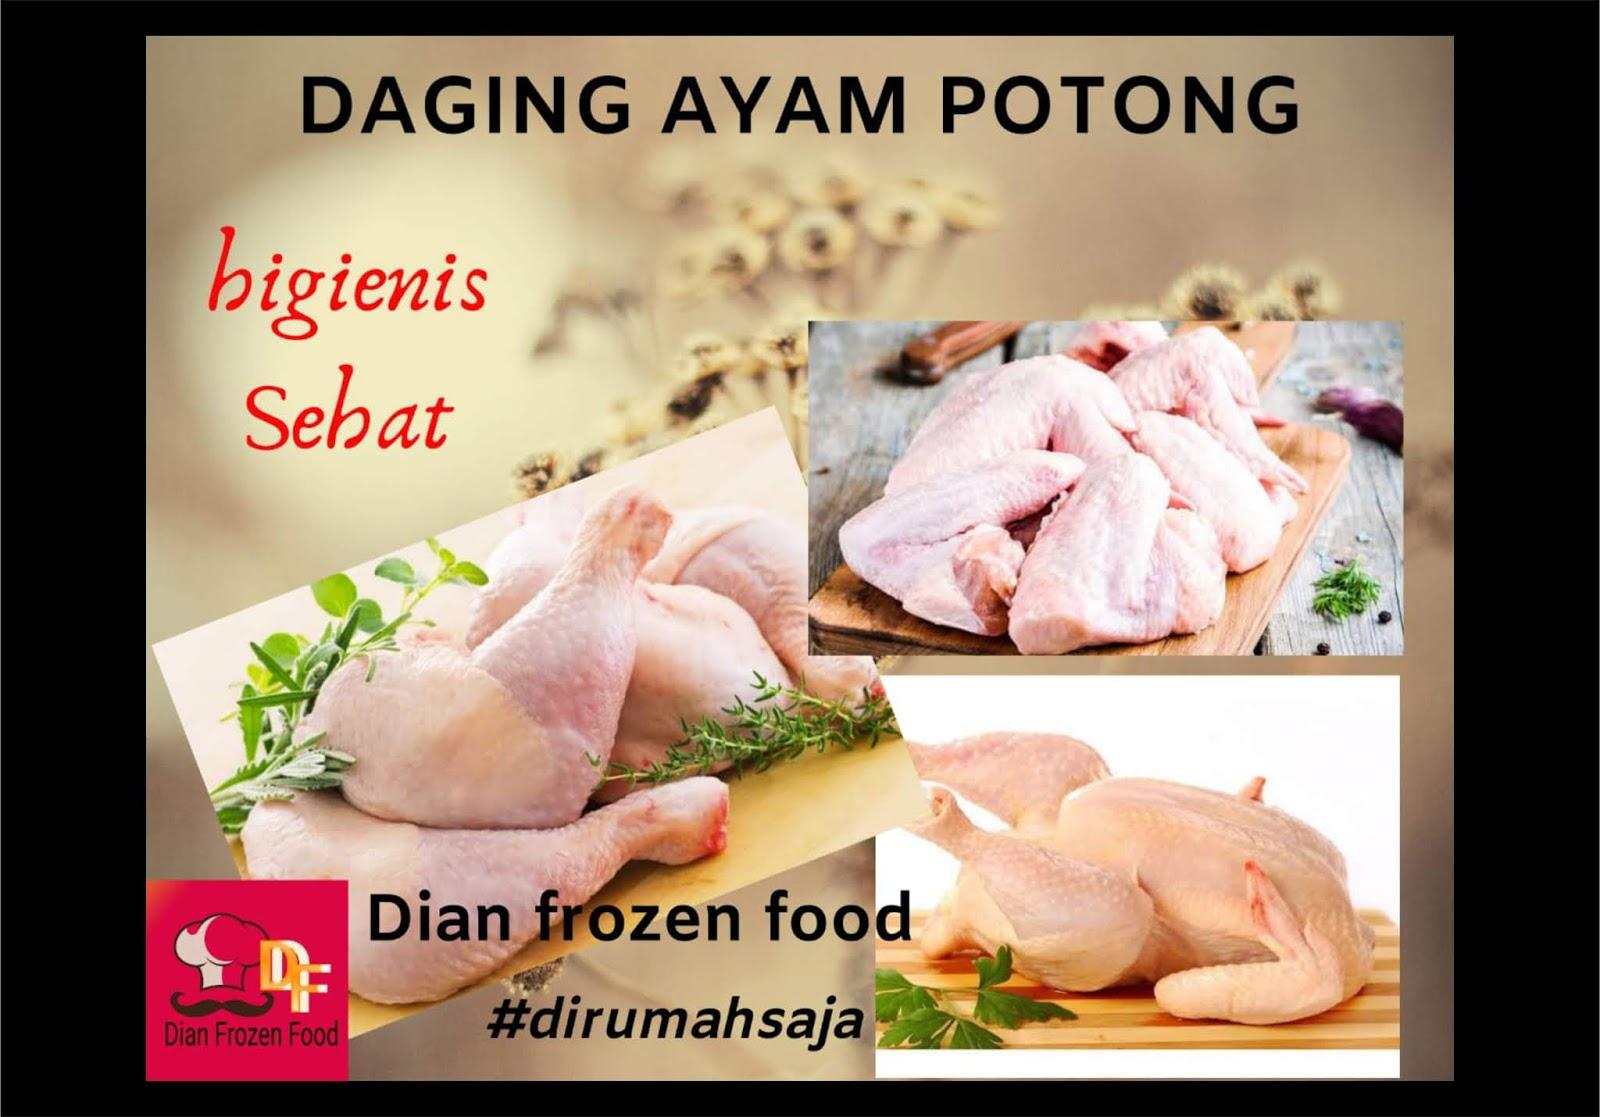 Daging Ayam Potong Rp. 32.000/kg